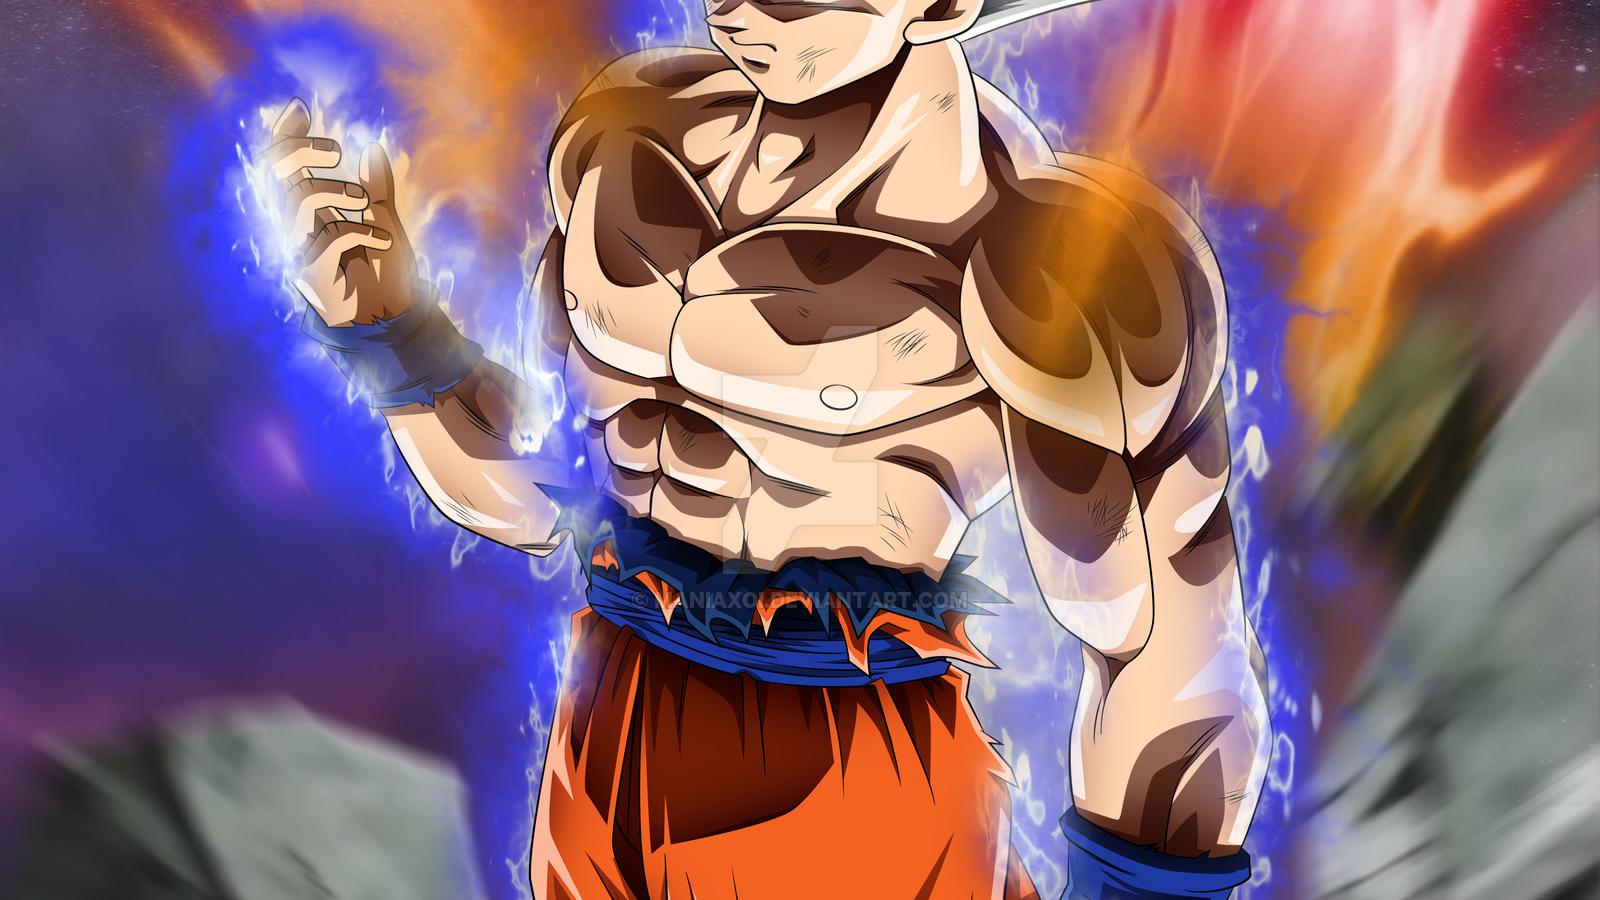 Free Download Goku Mastered Ultra Instinct By Maniaxoi